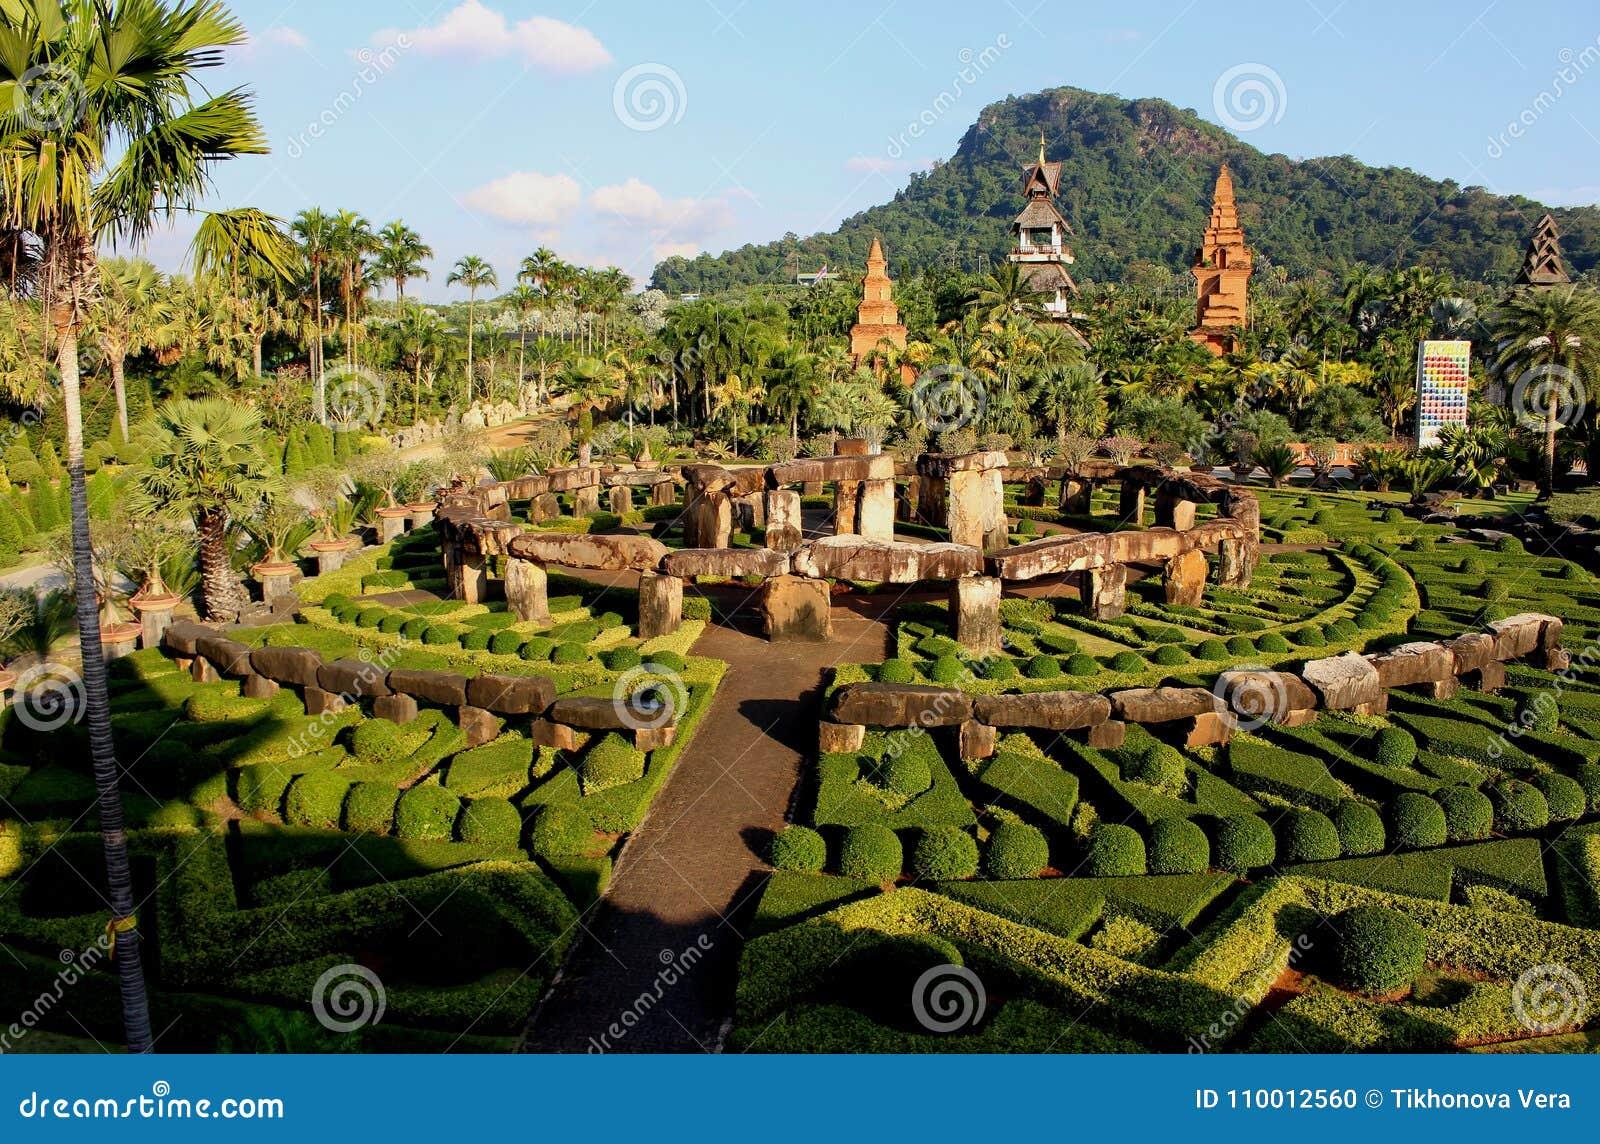 Landscape Nong Nooch Tropical Botanical Garden.